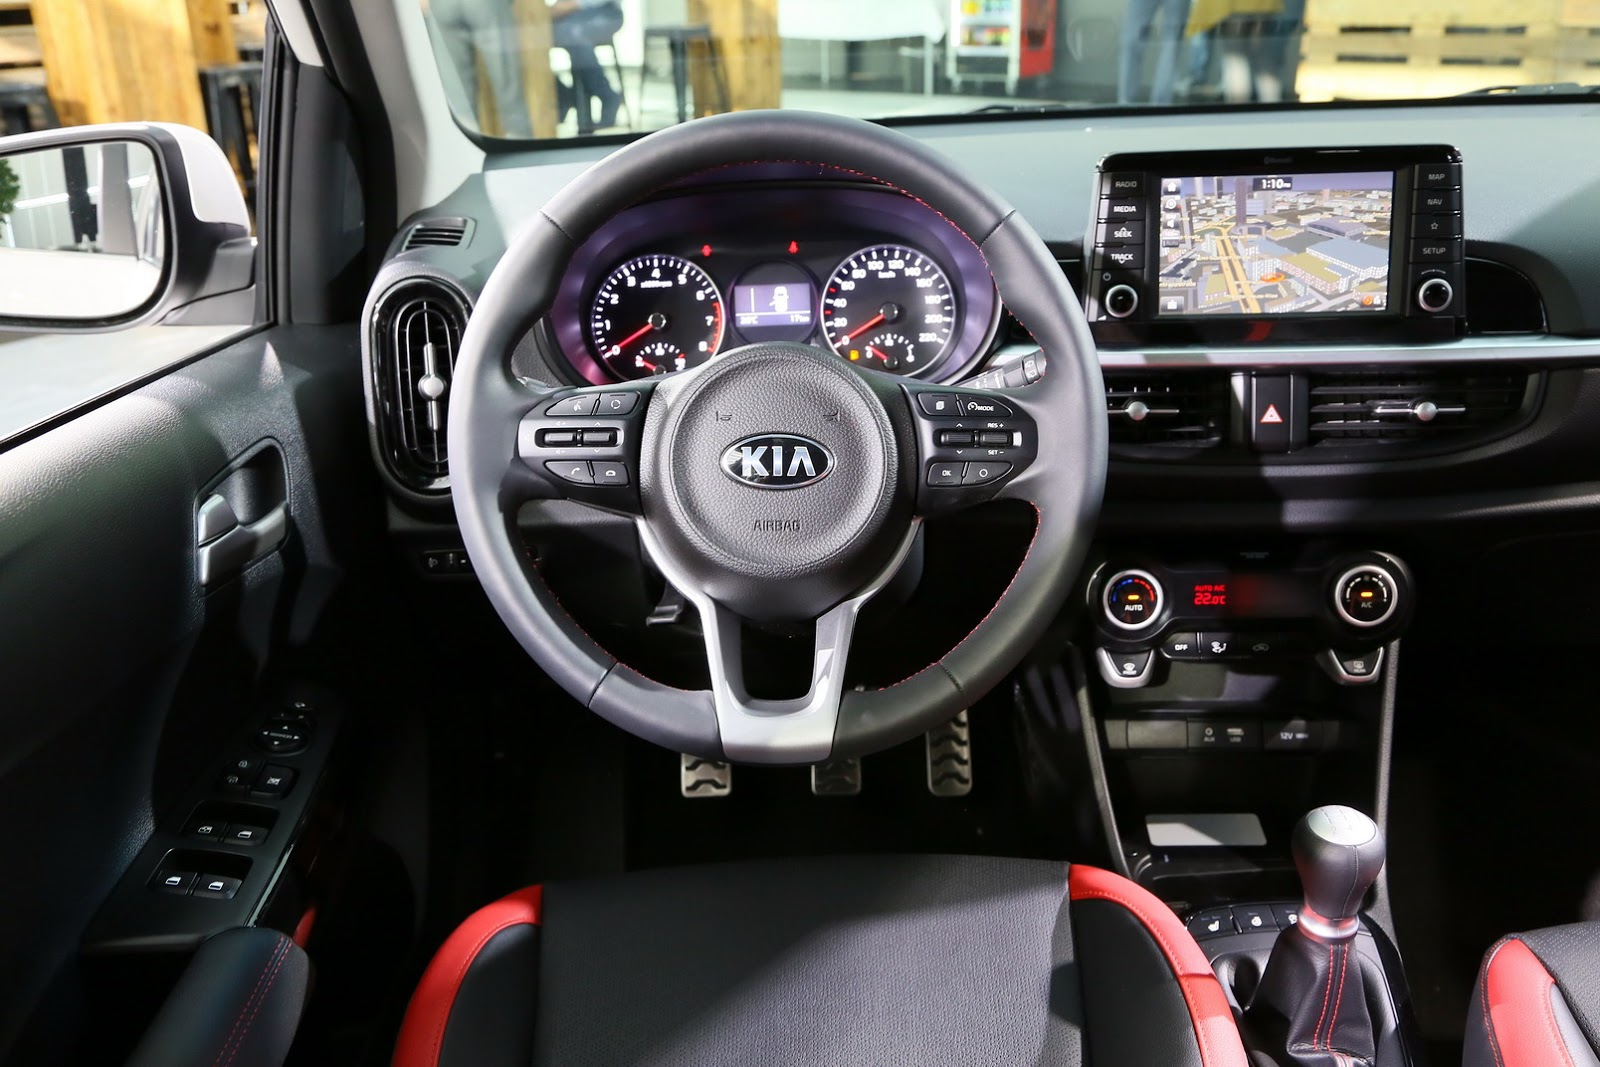 2017-Kia-Picanto-34 – AutonetMagz :: Review Mobil dan ...